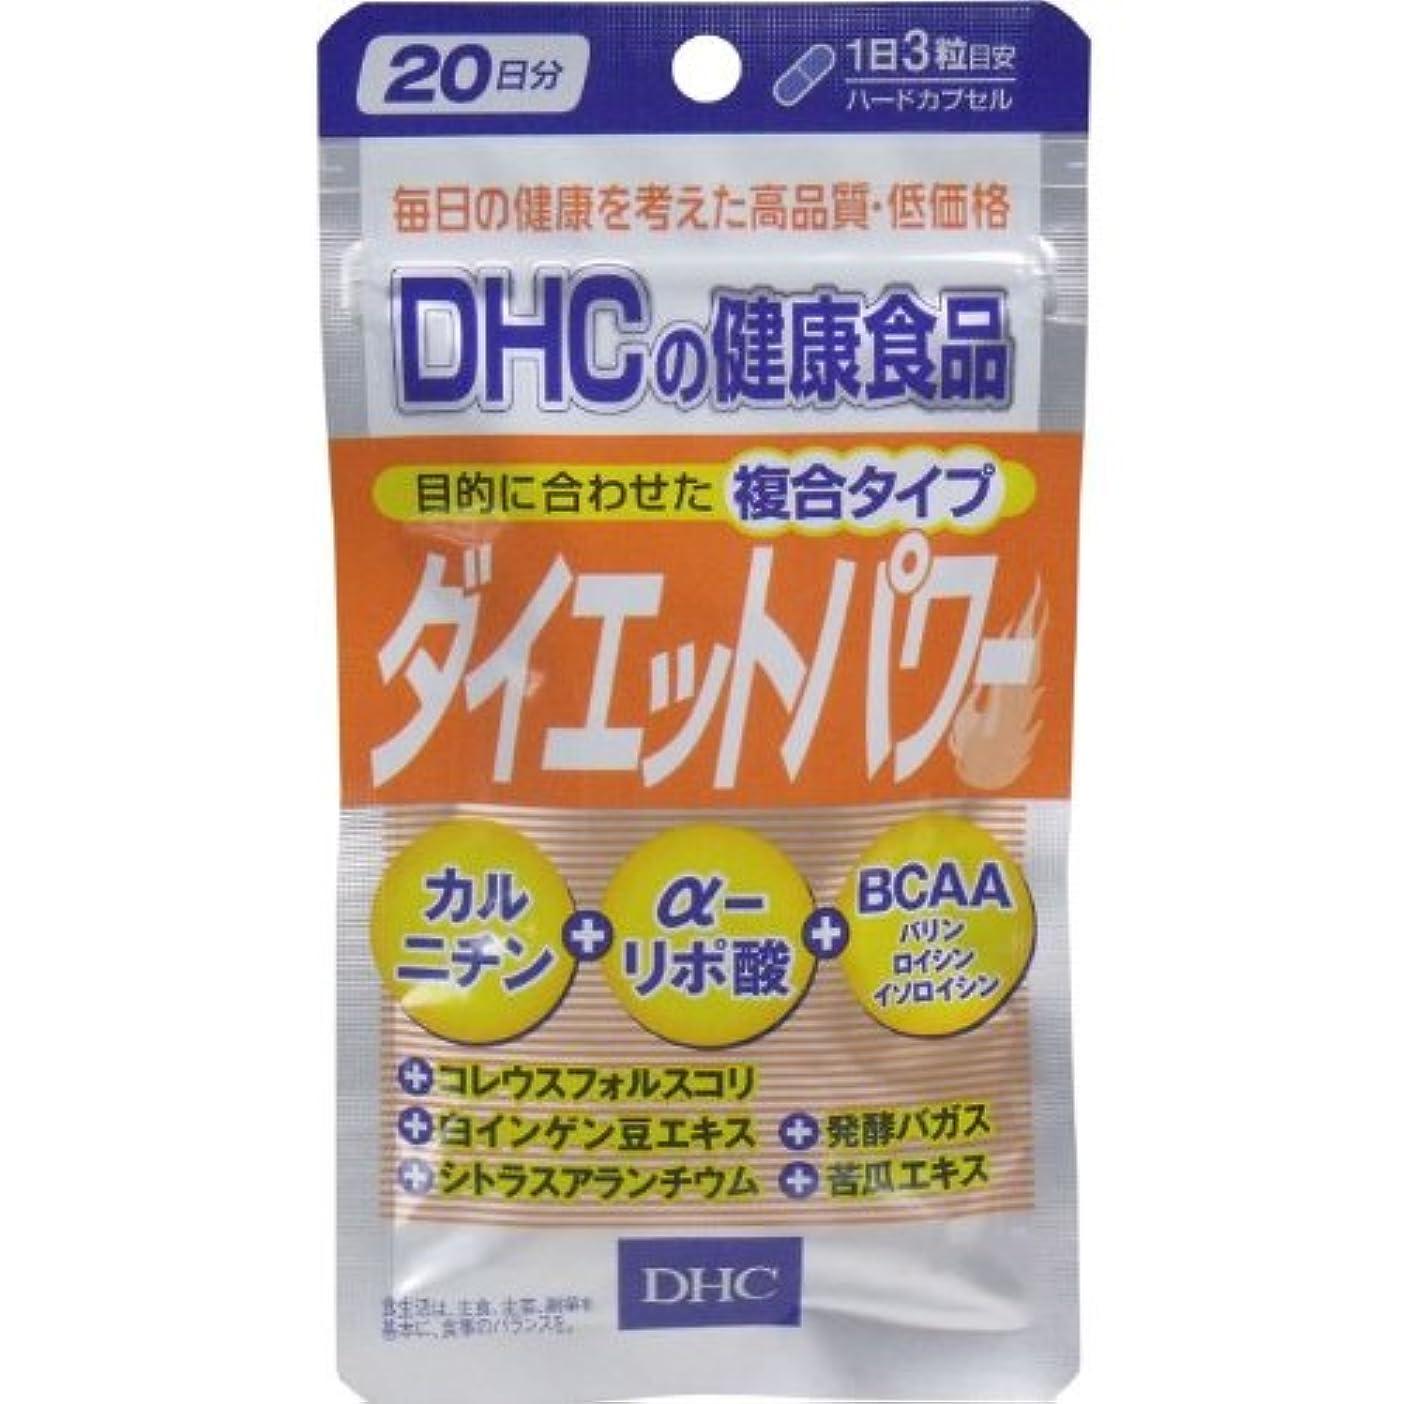 DHC ダイエットパワー 60粒入 20日分「5点セット」